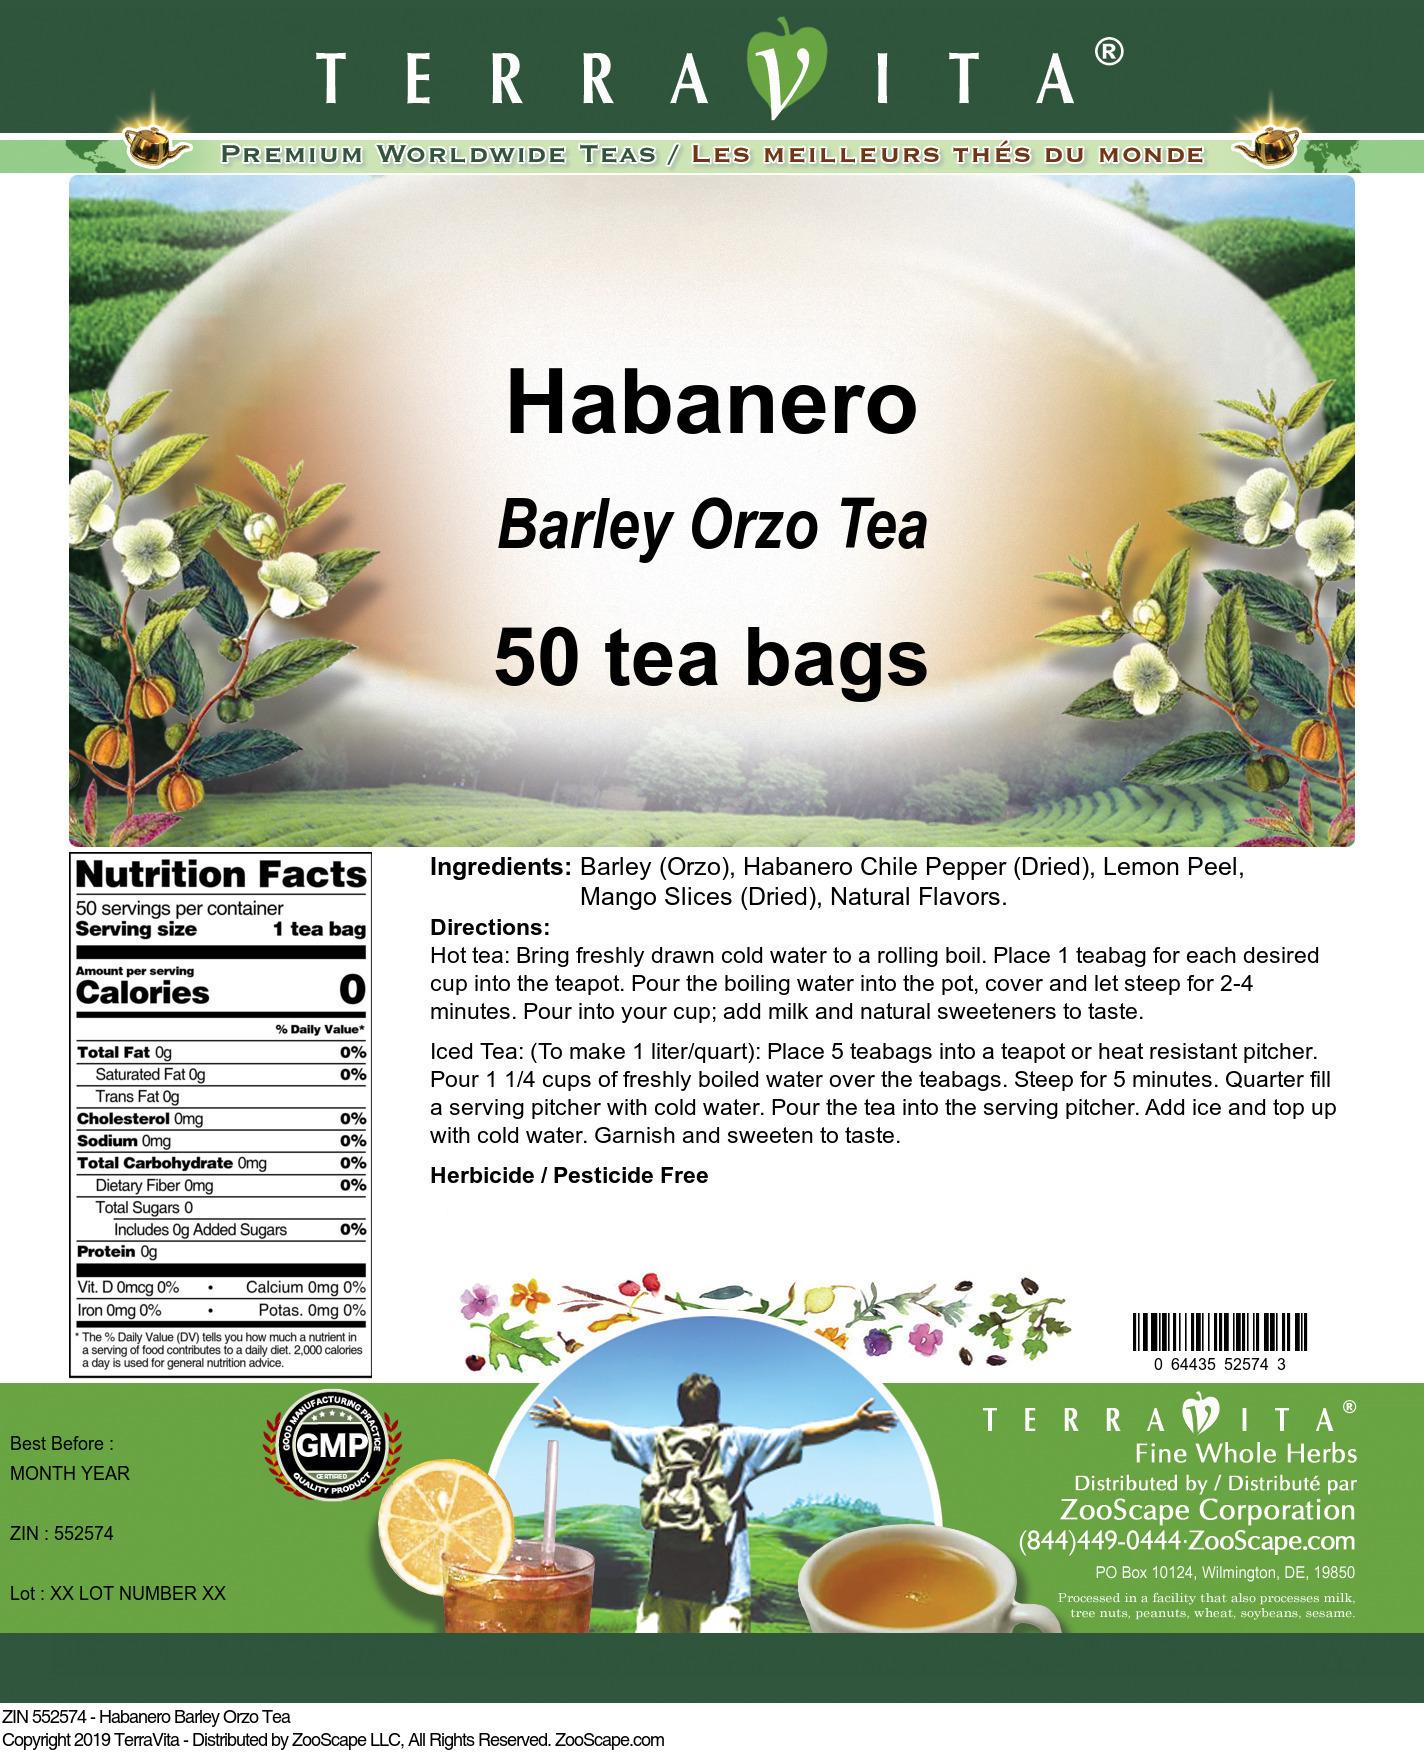 Habanero Barley Orzo Tea